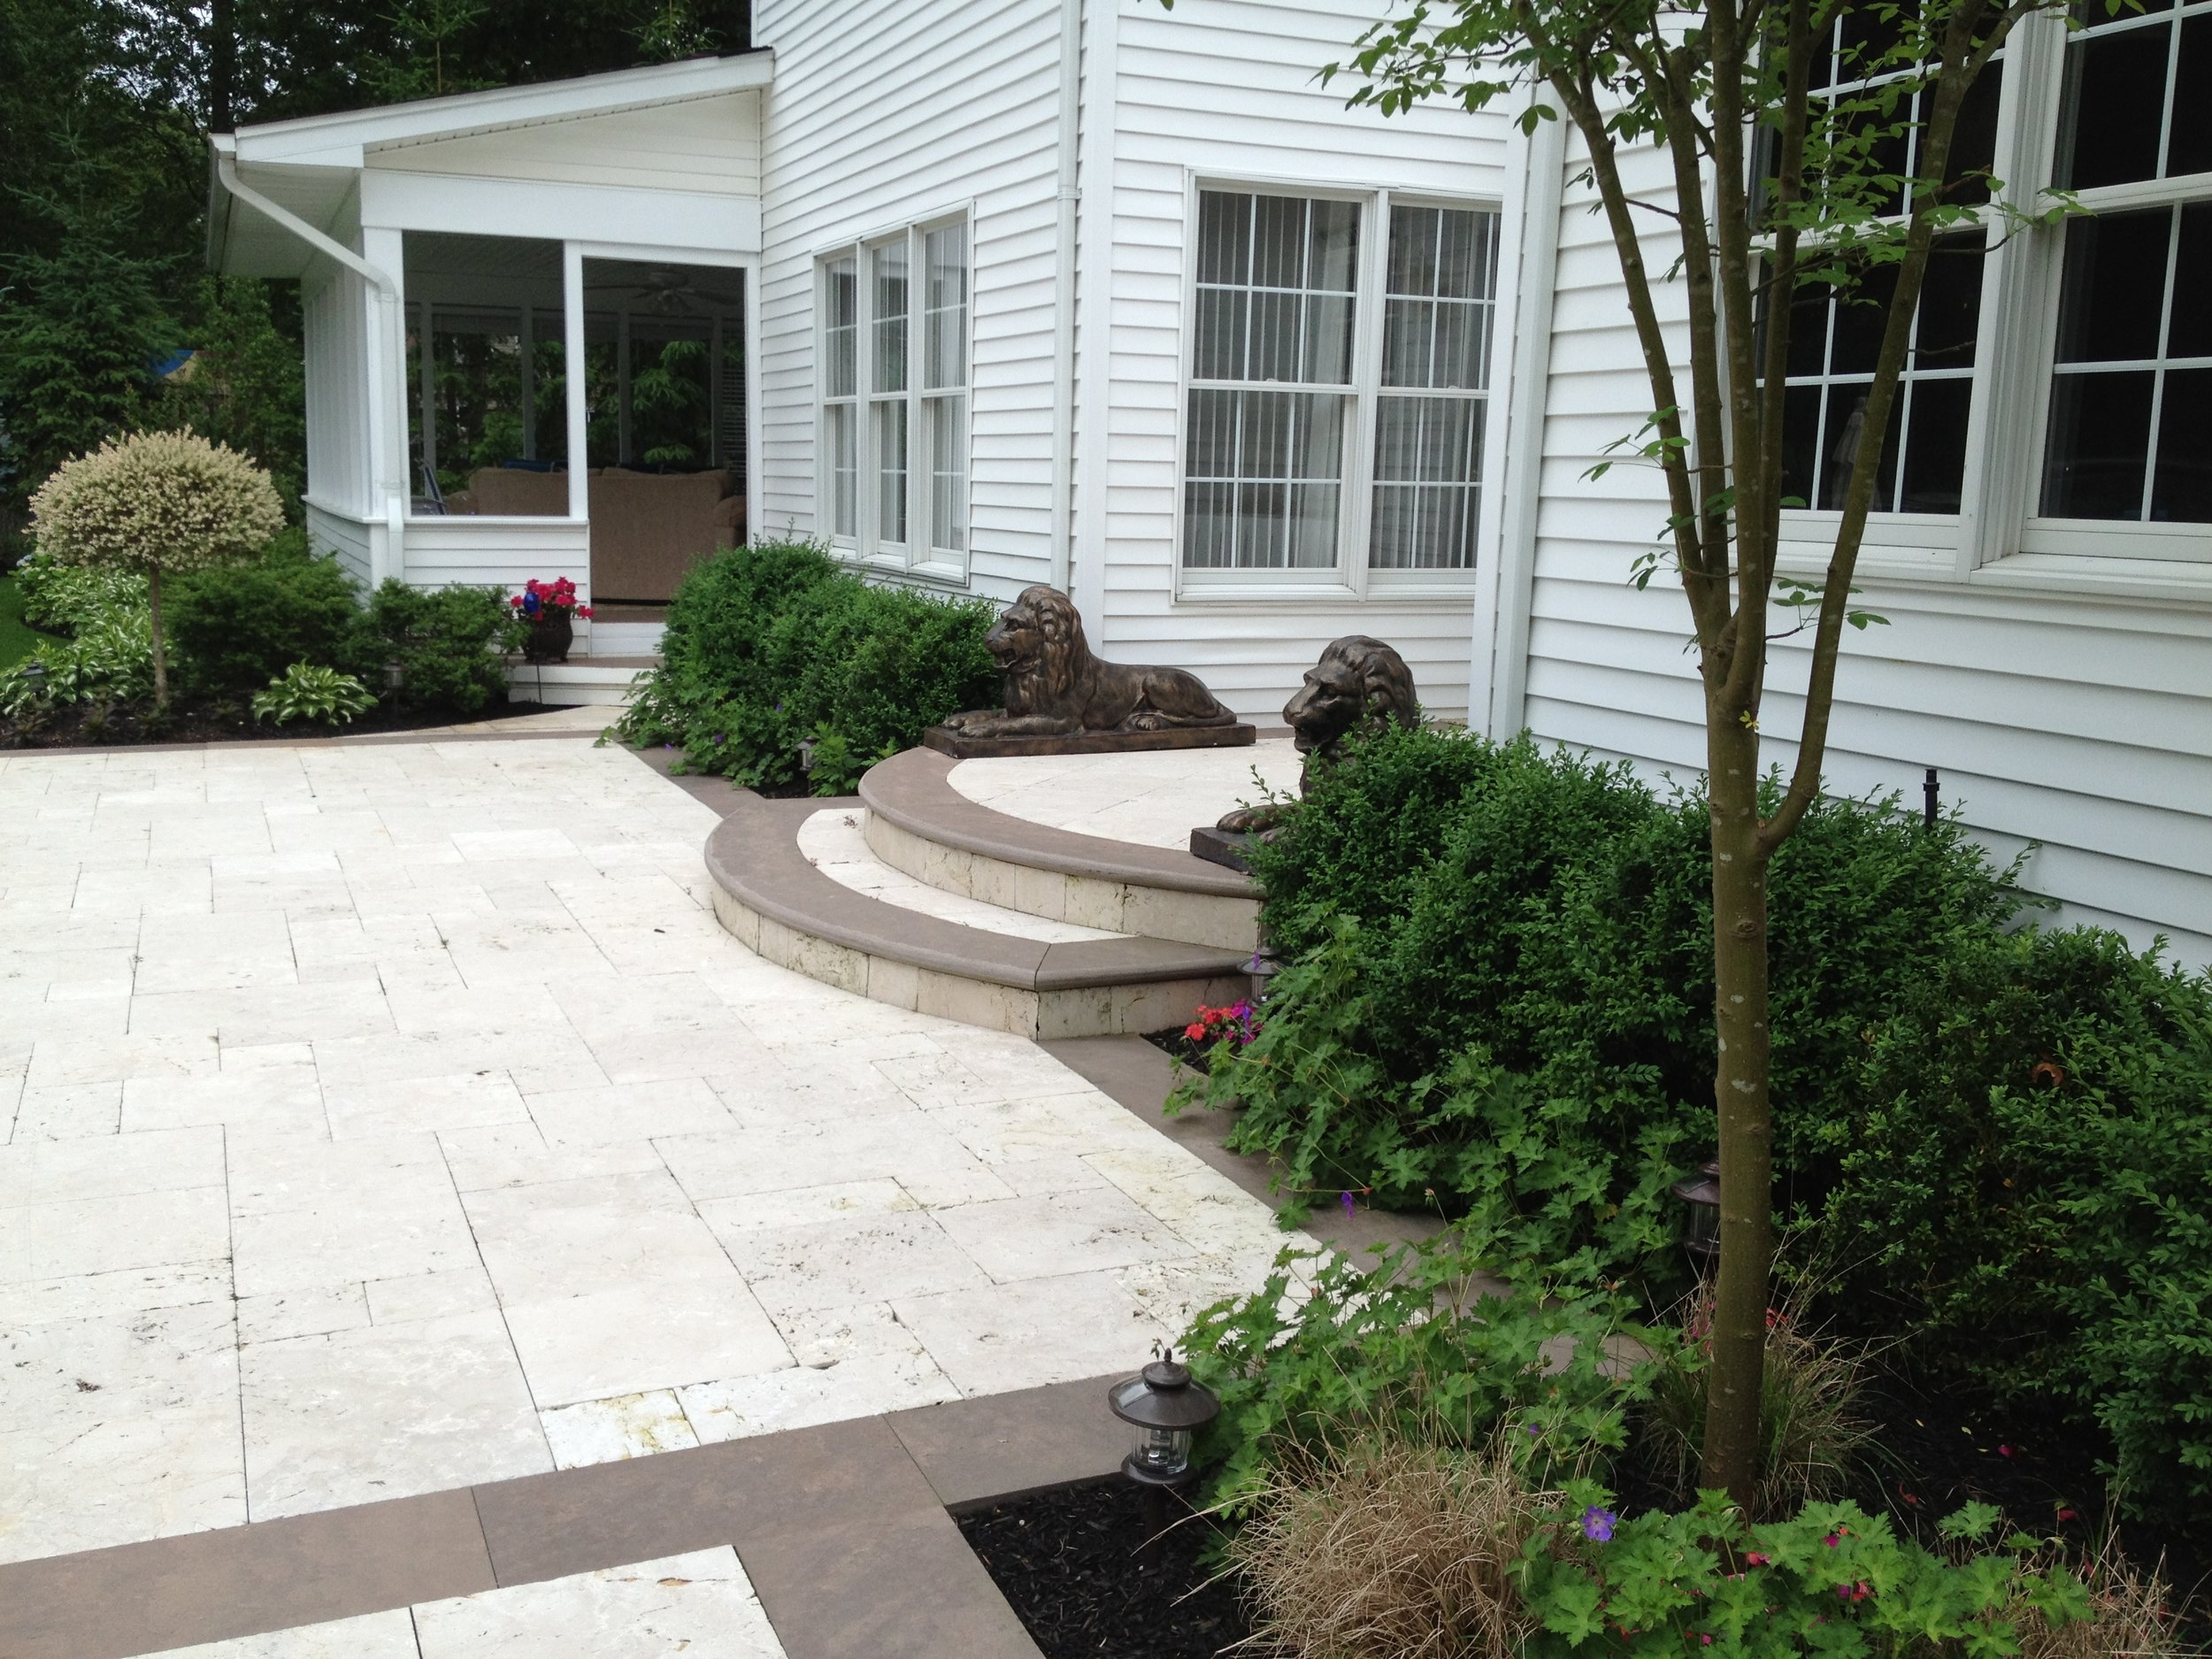 Experienced patio design in Long Island, NY